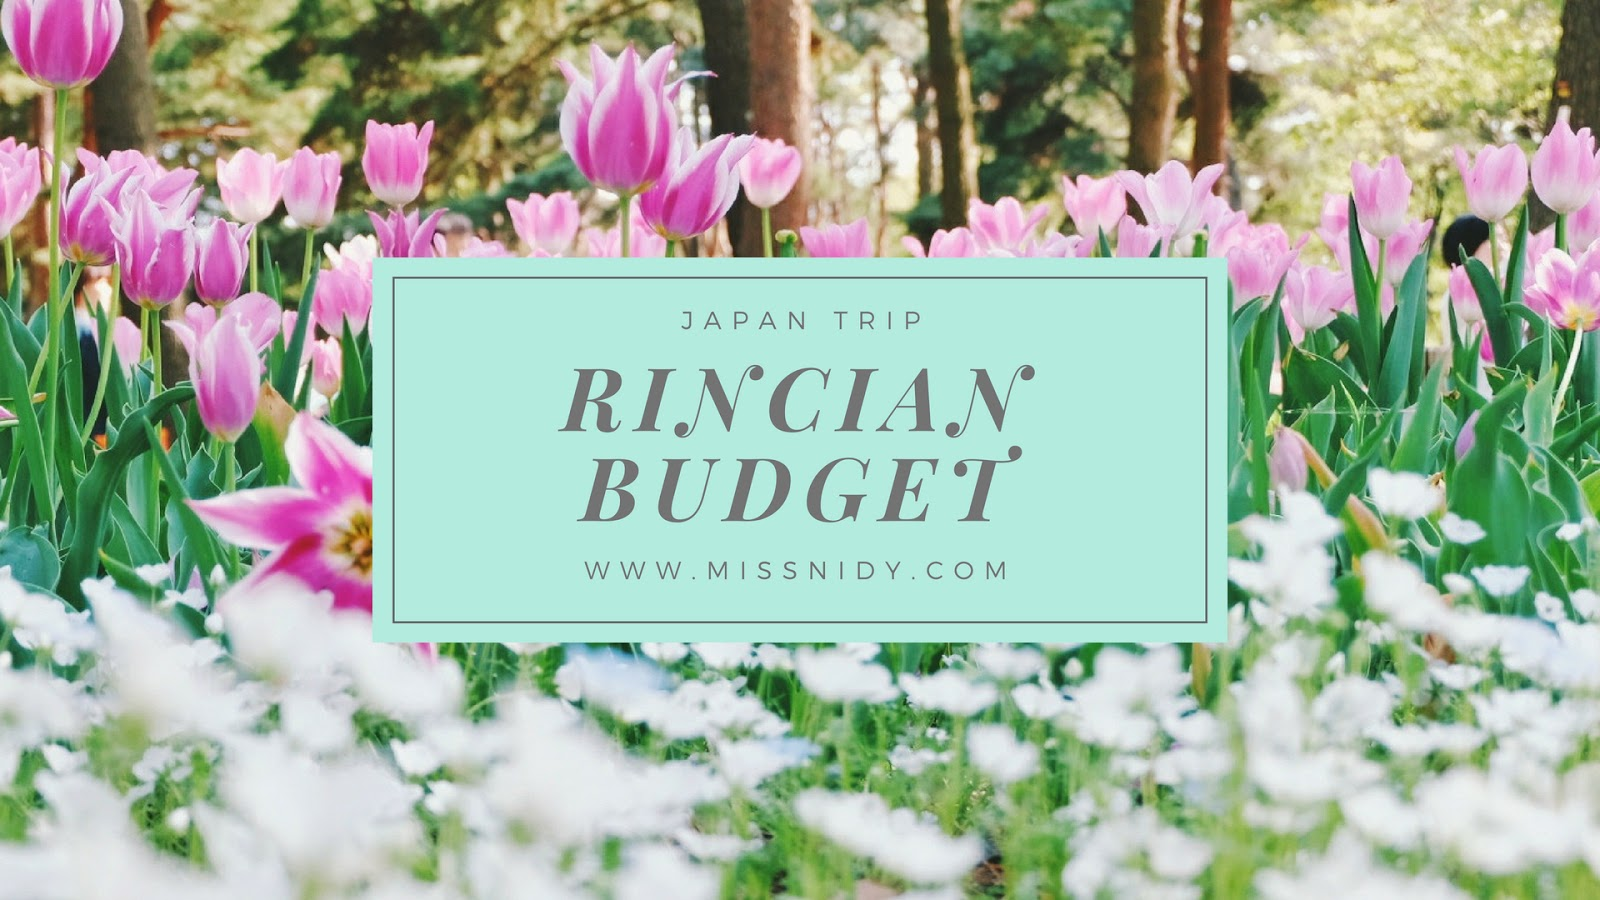 rincian budget travelling ke jepang